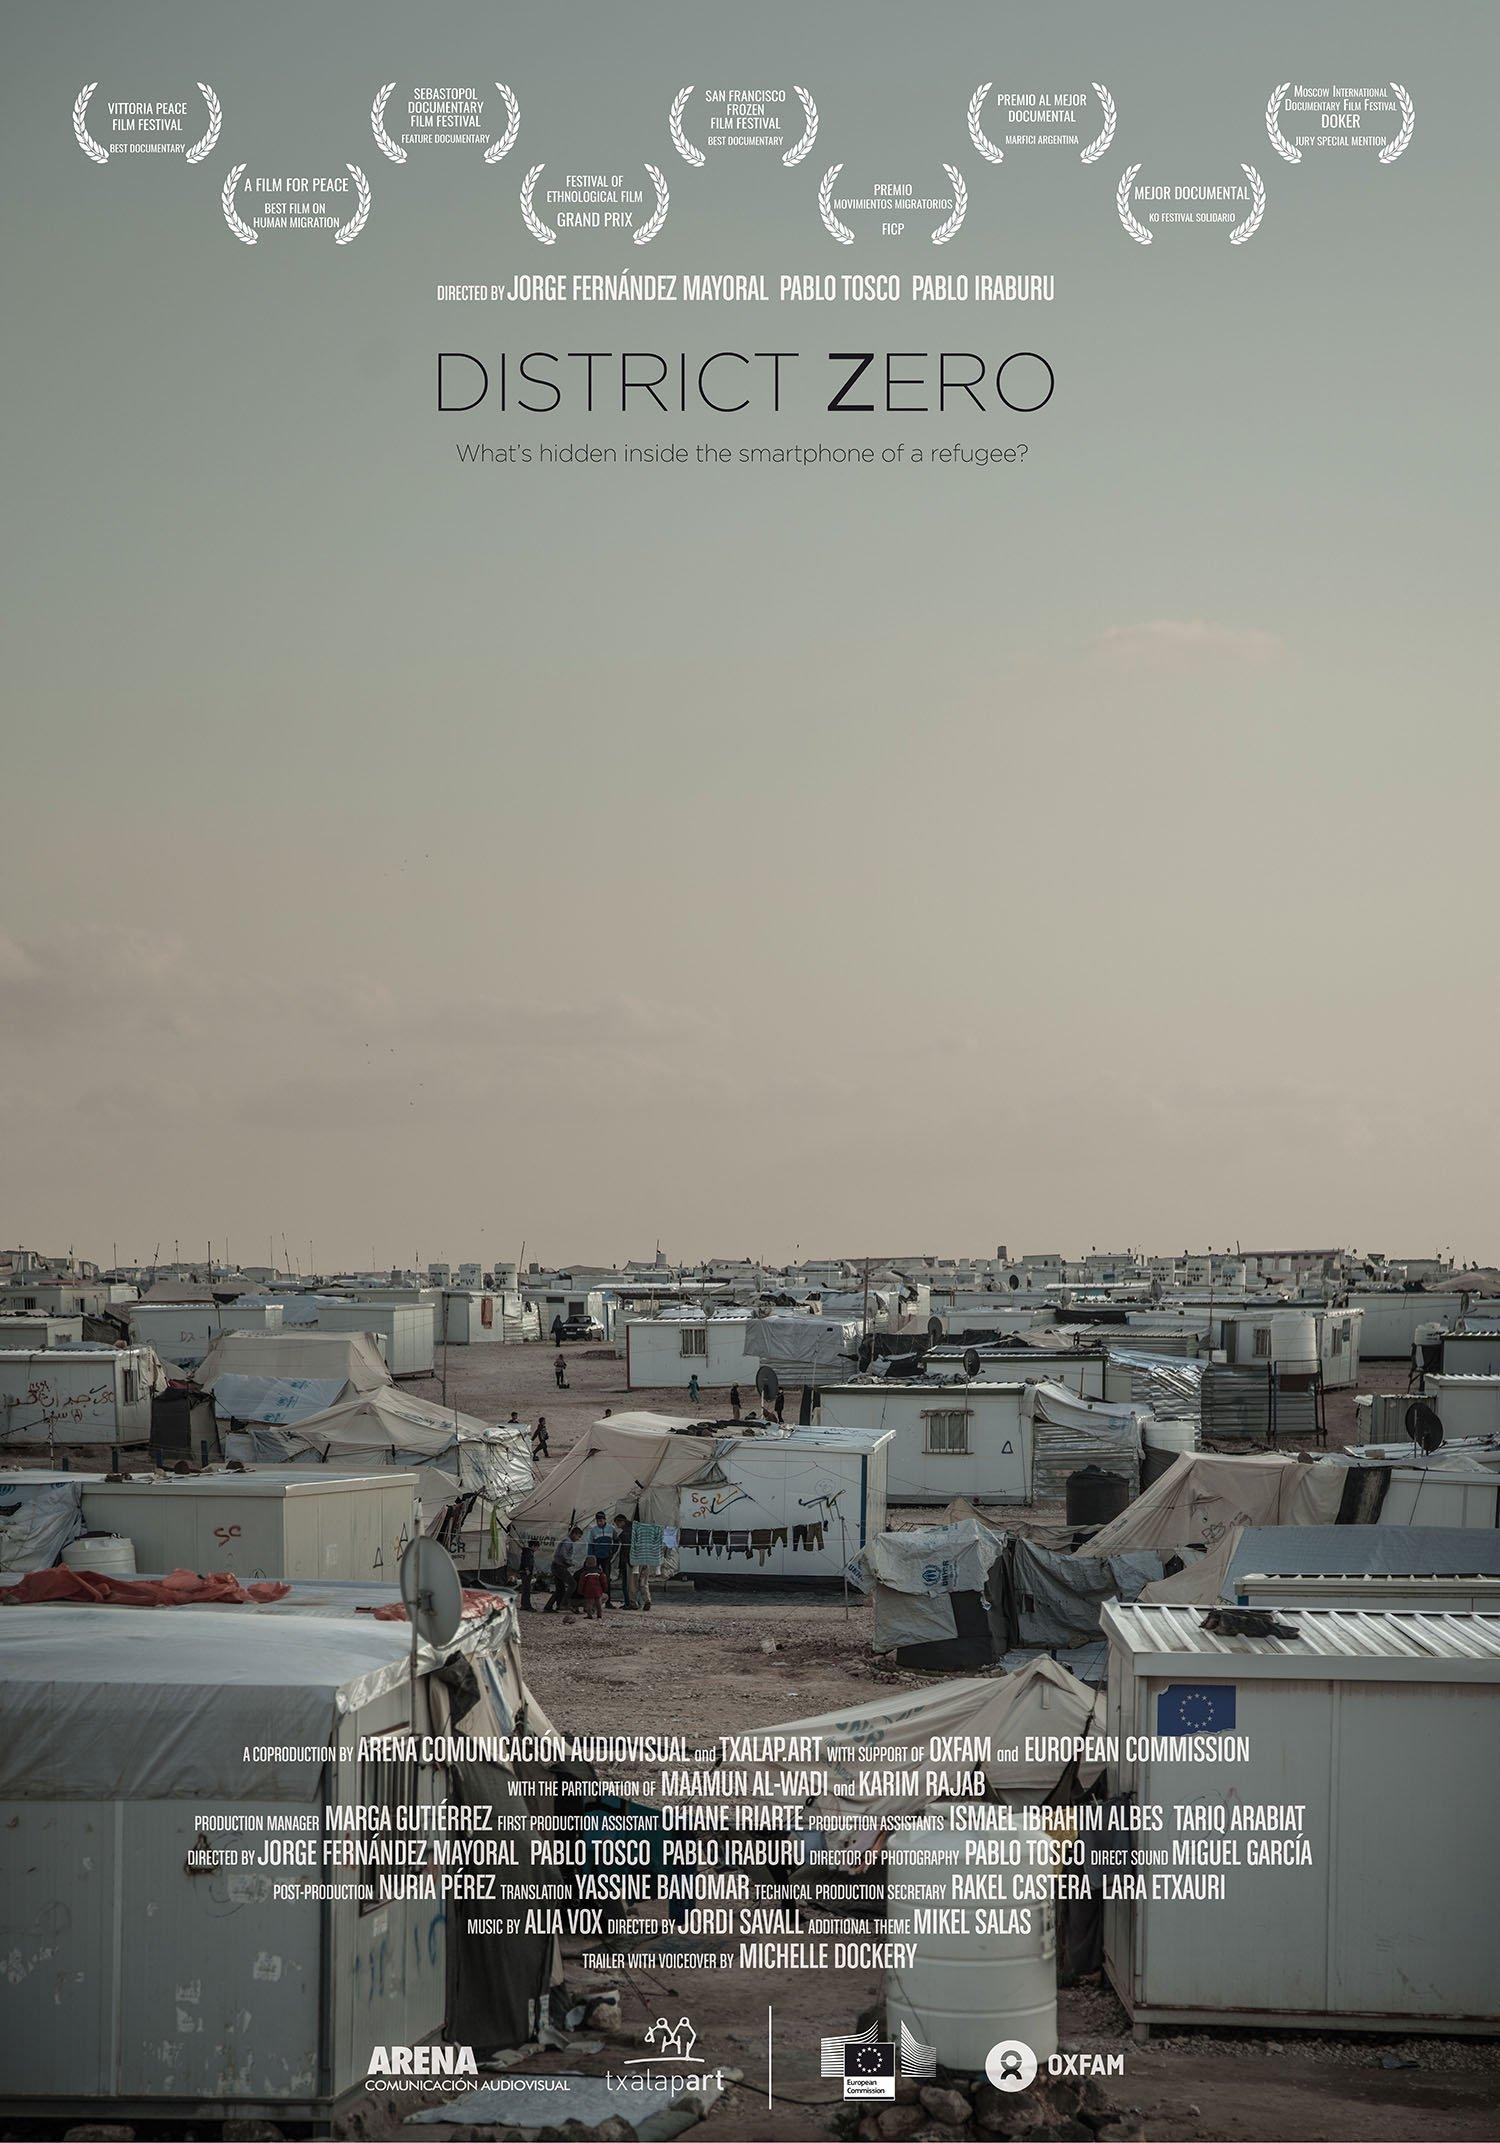 districtzero.org